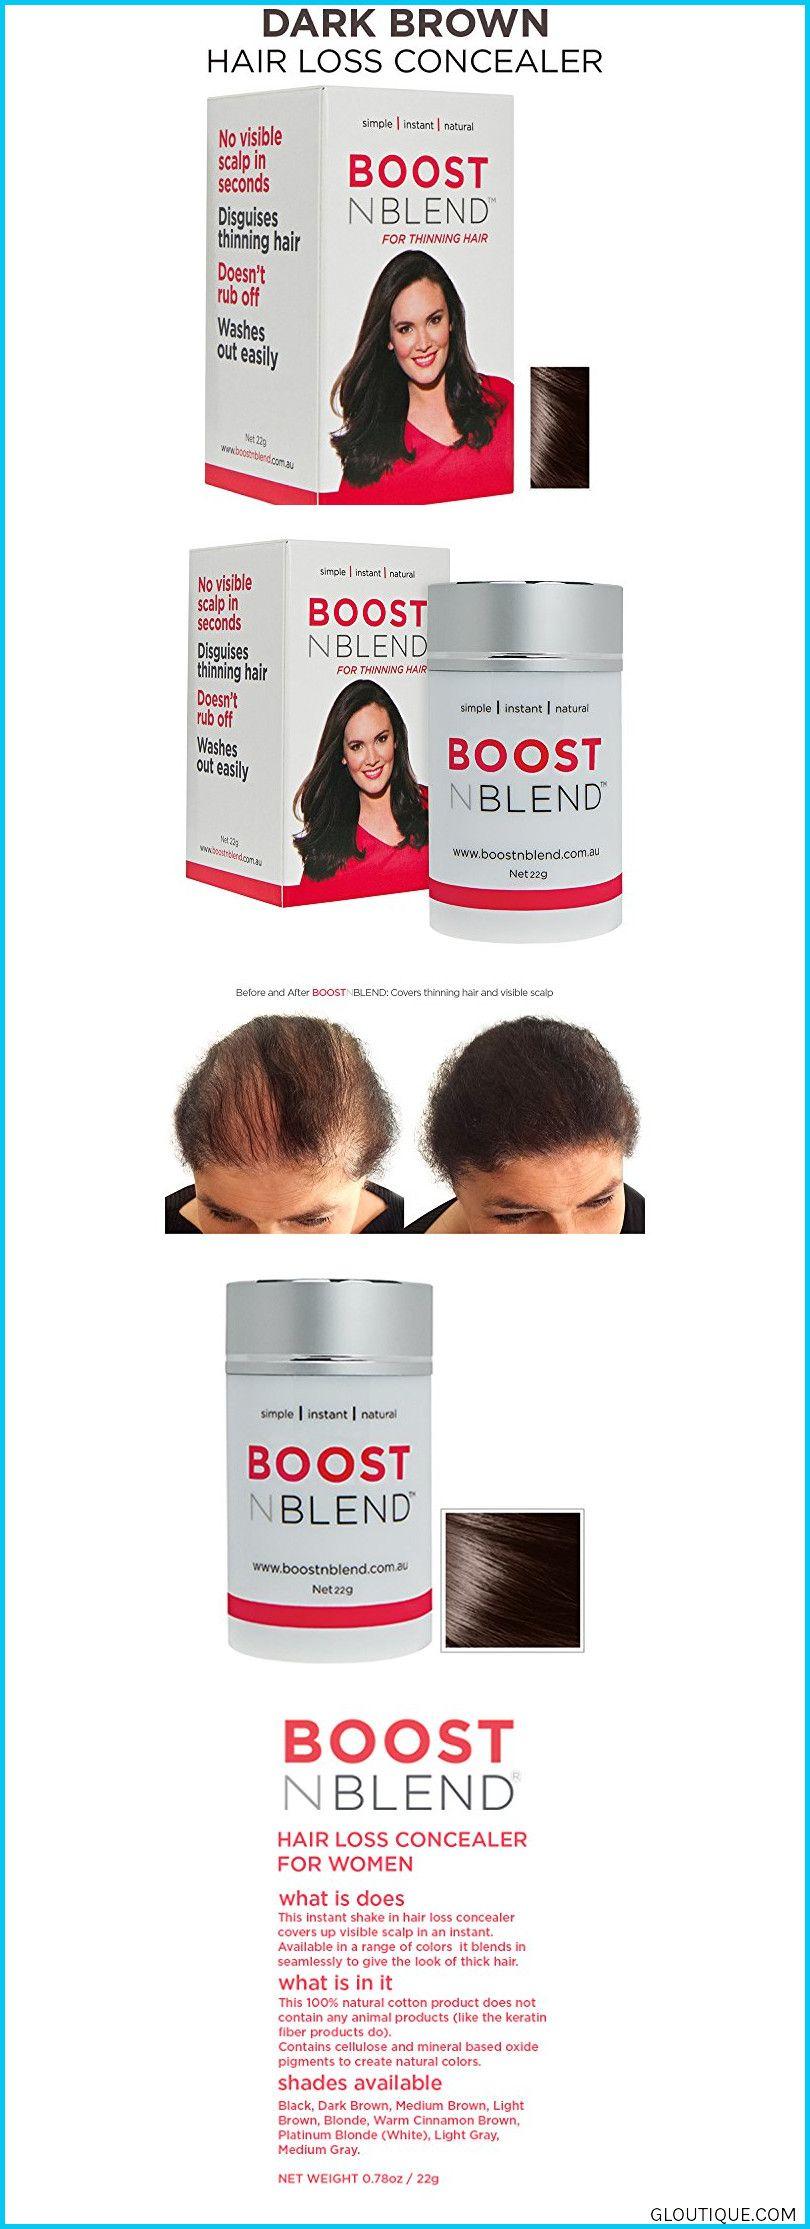 Boost N Blend Dark Brown Hair Fibers For Thinning Hair Women S Hair Loss Concealer Thick Natural Cotton Hair Building Fiber Filler For Women Hair Thickeni Thick Hair Styles